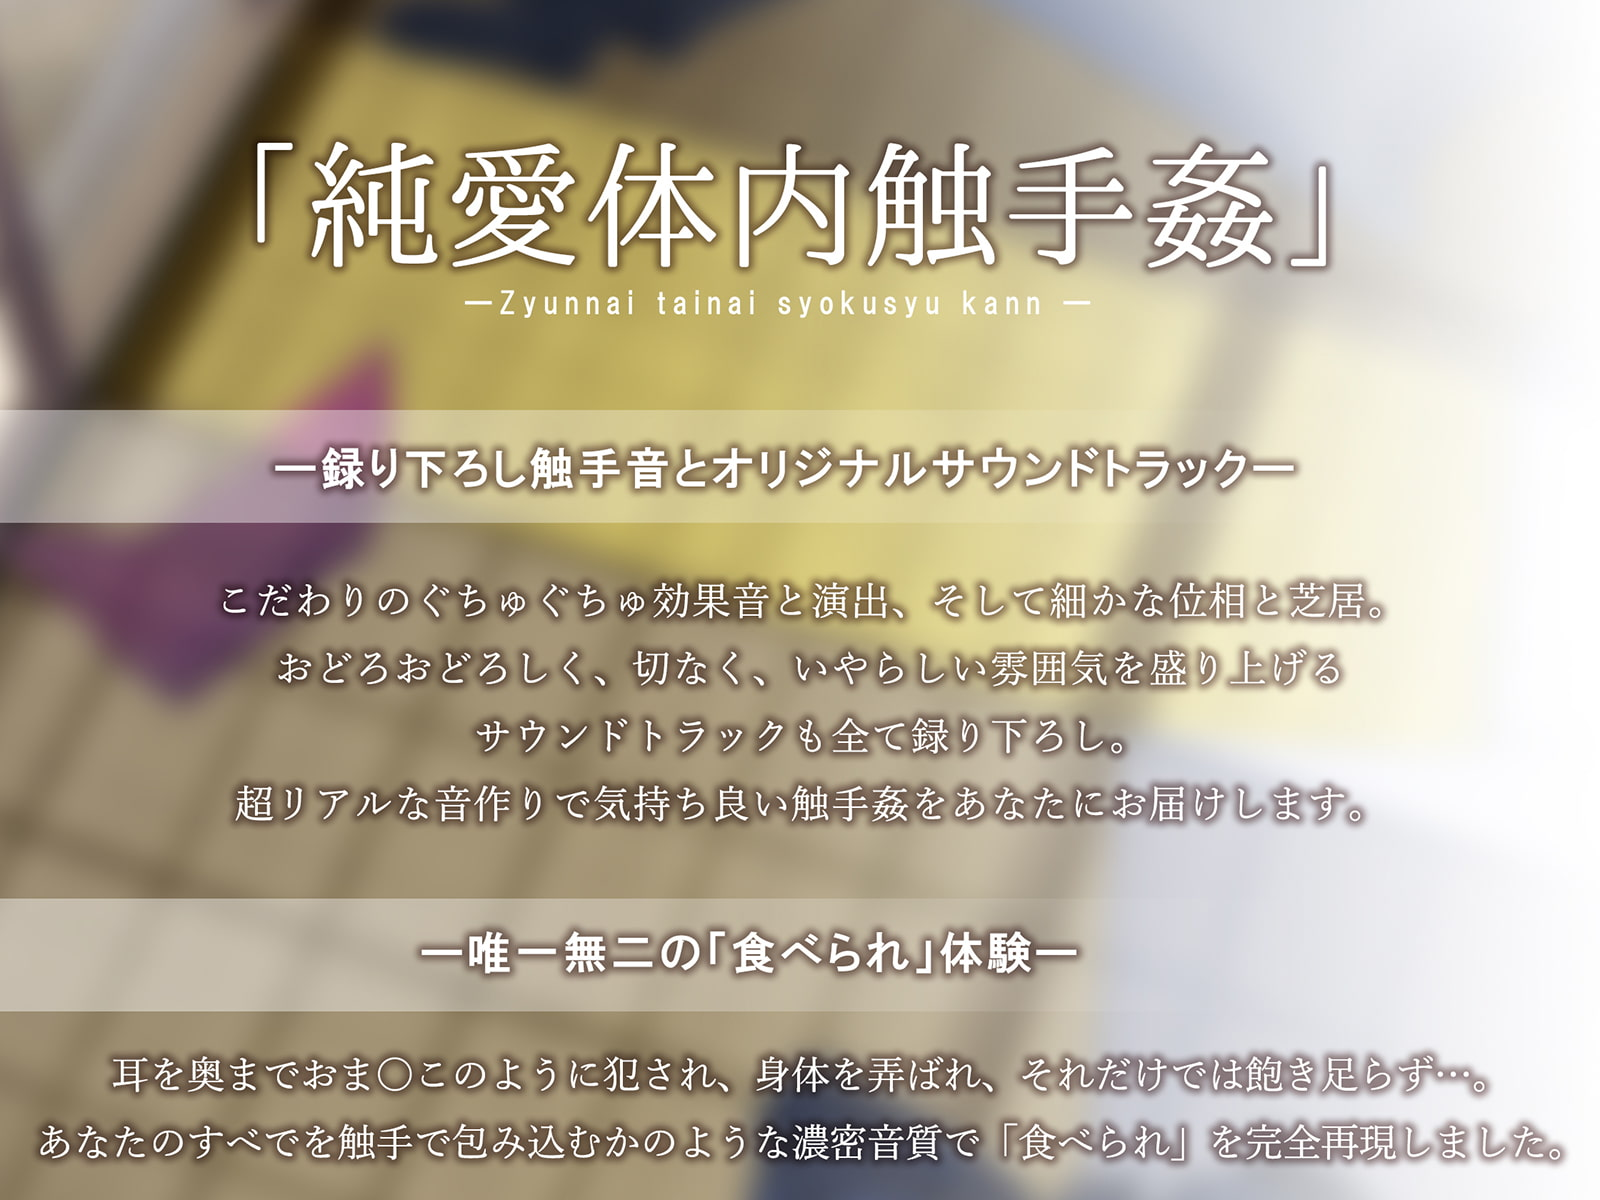 RJ319812 純愛体内触手姦 [20210308]